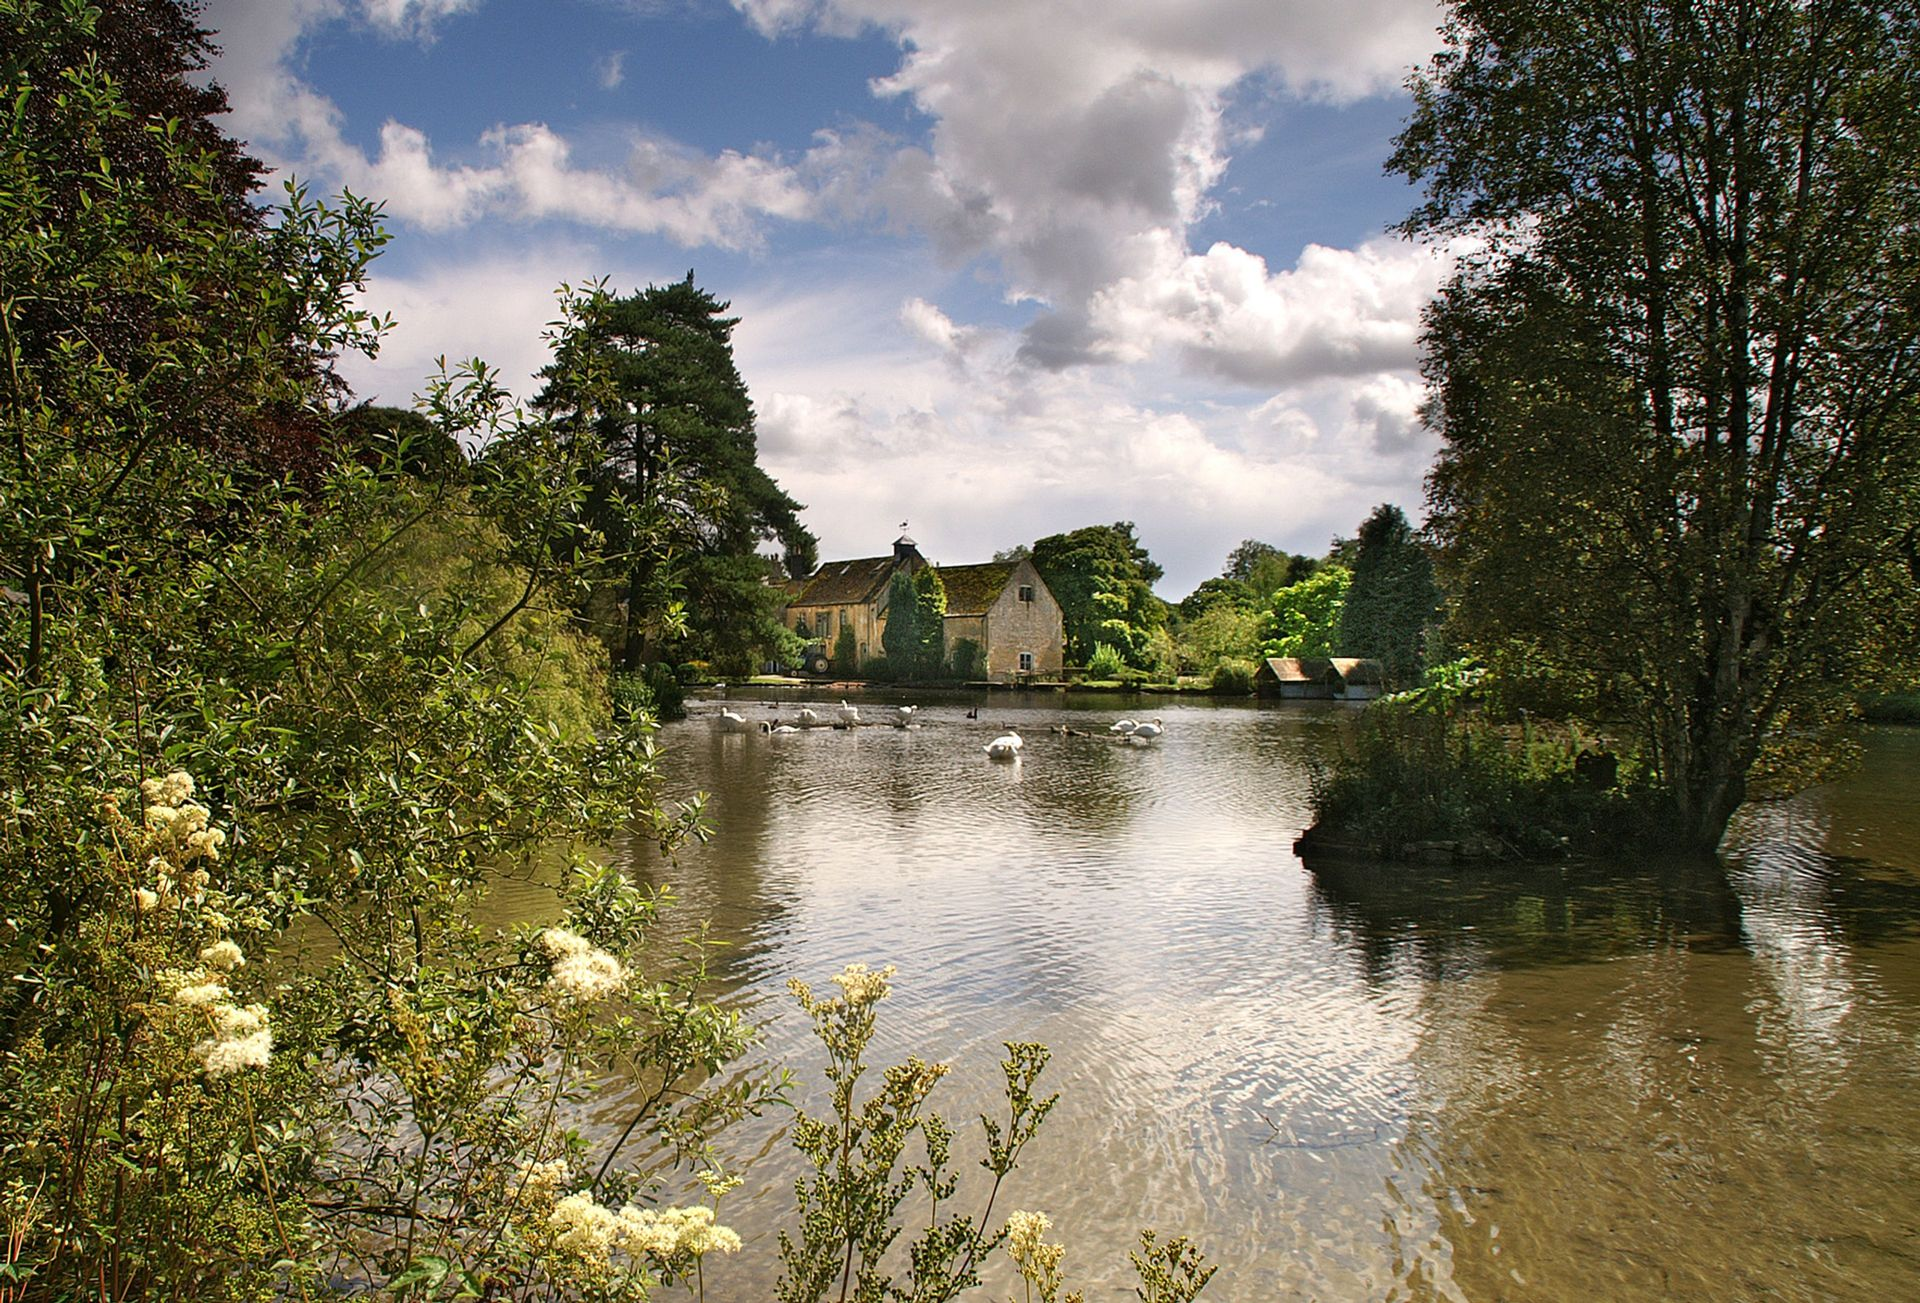 A view across the lake